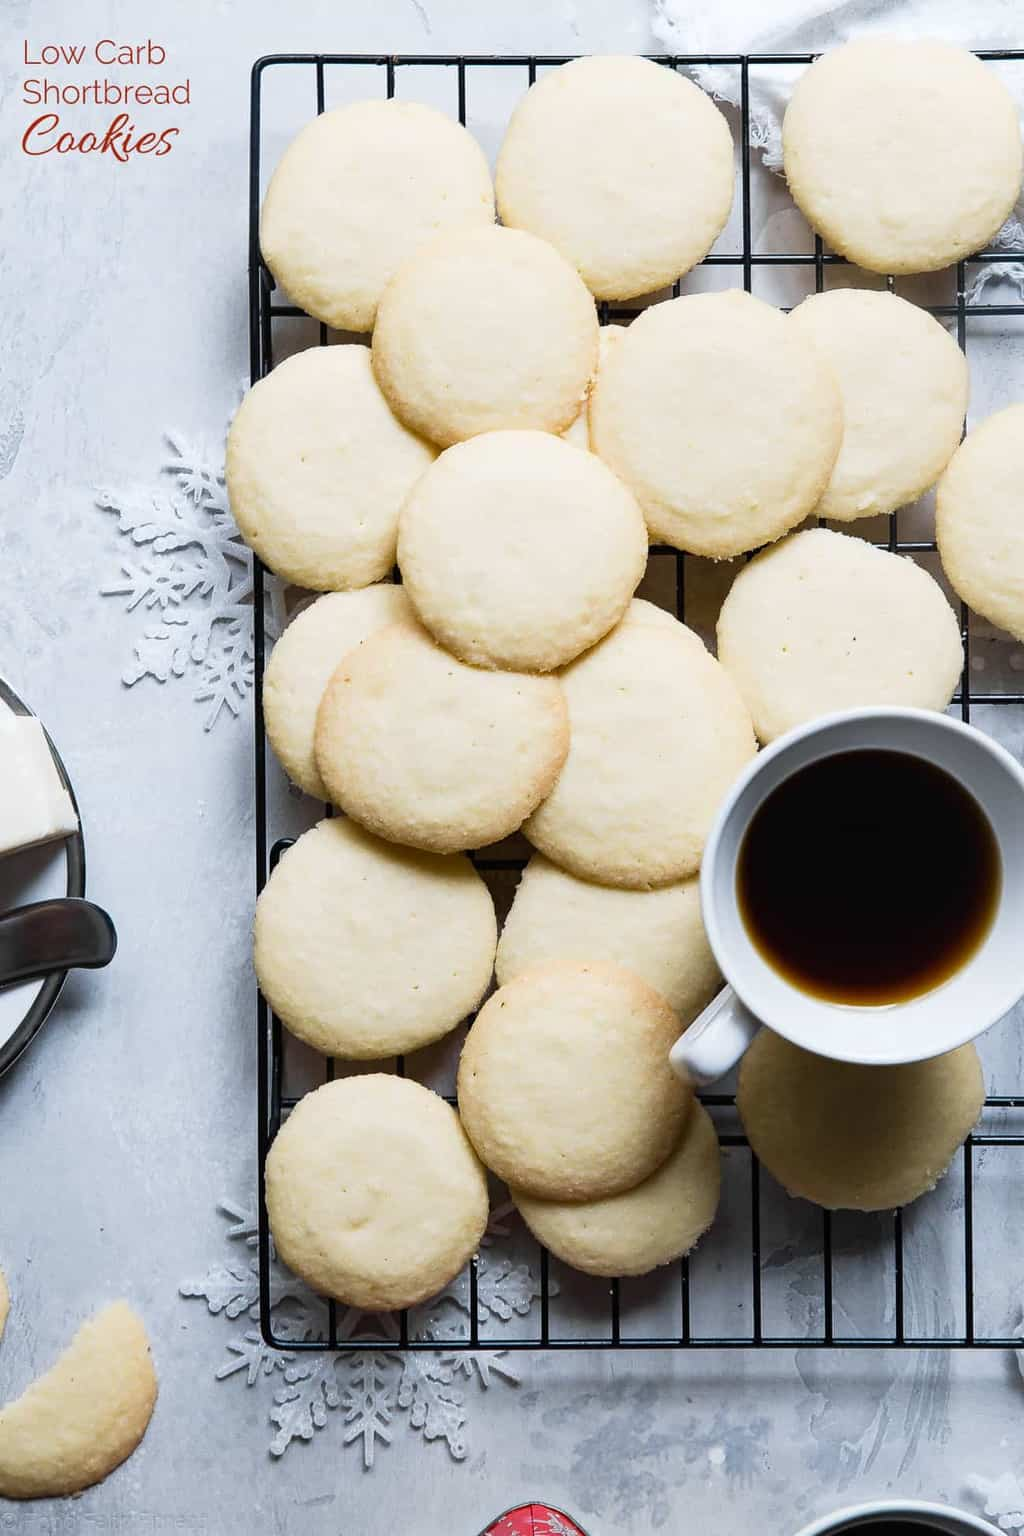 Keto Shortbread Cookies plus more great recipes for keto cookies!